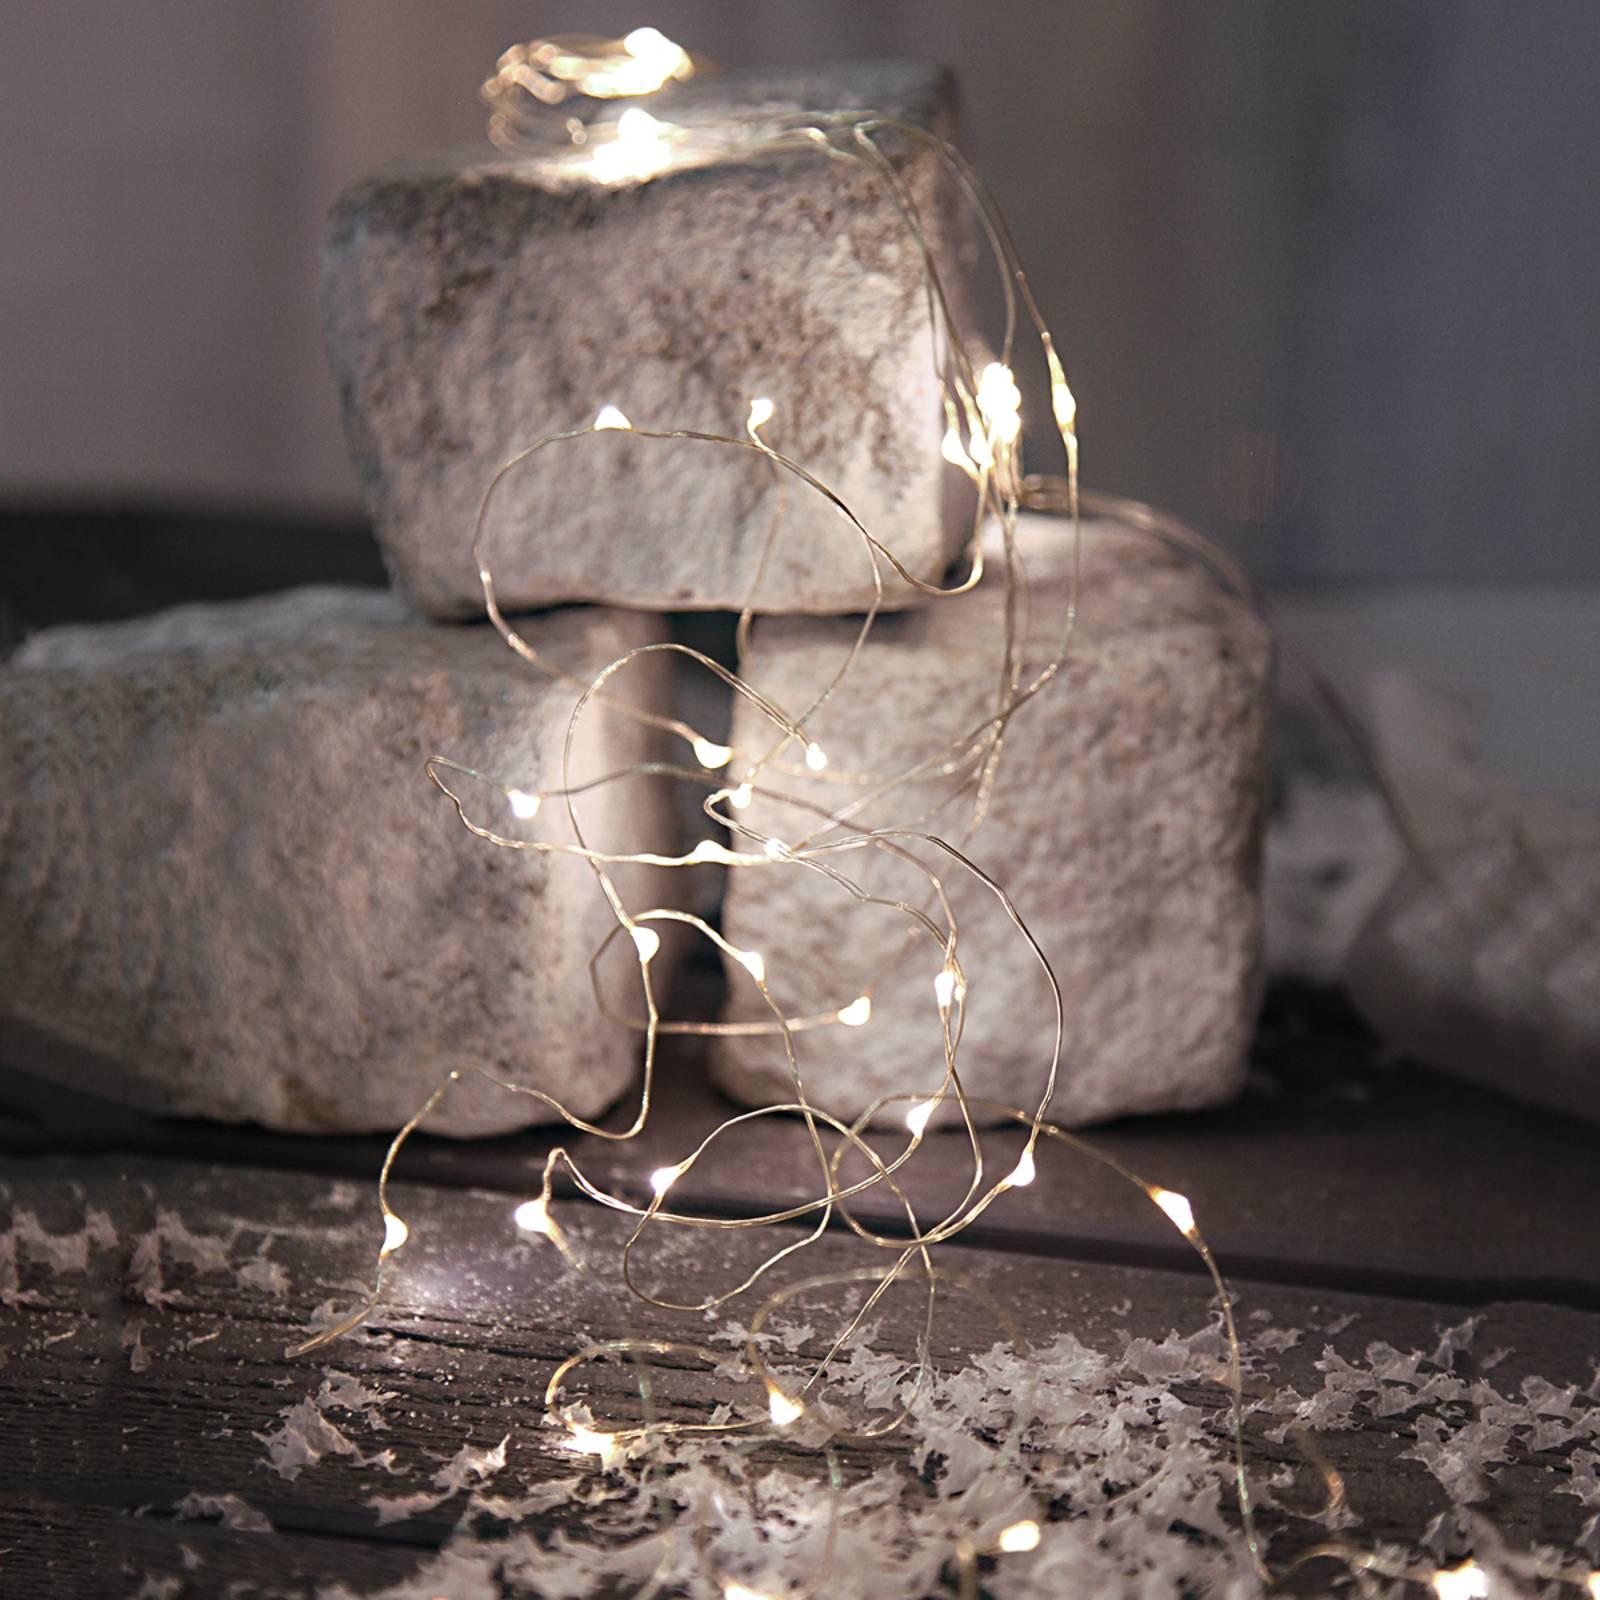 Paristokäyttöinen Dew Drops -LED-valoketju